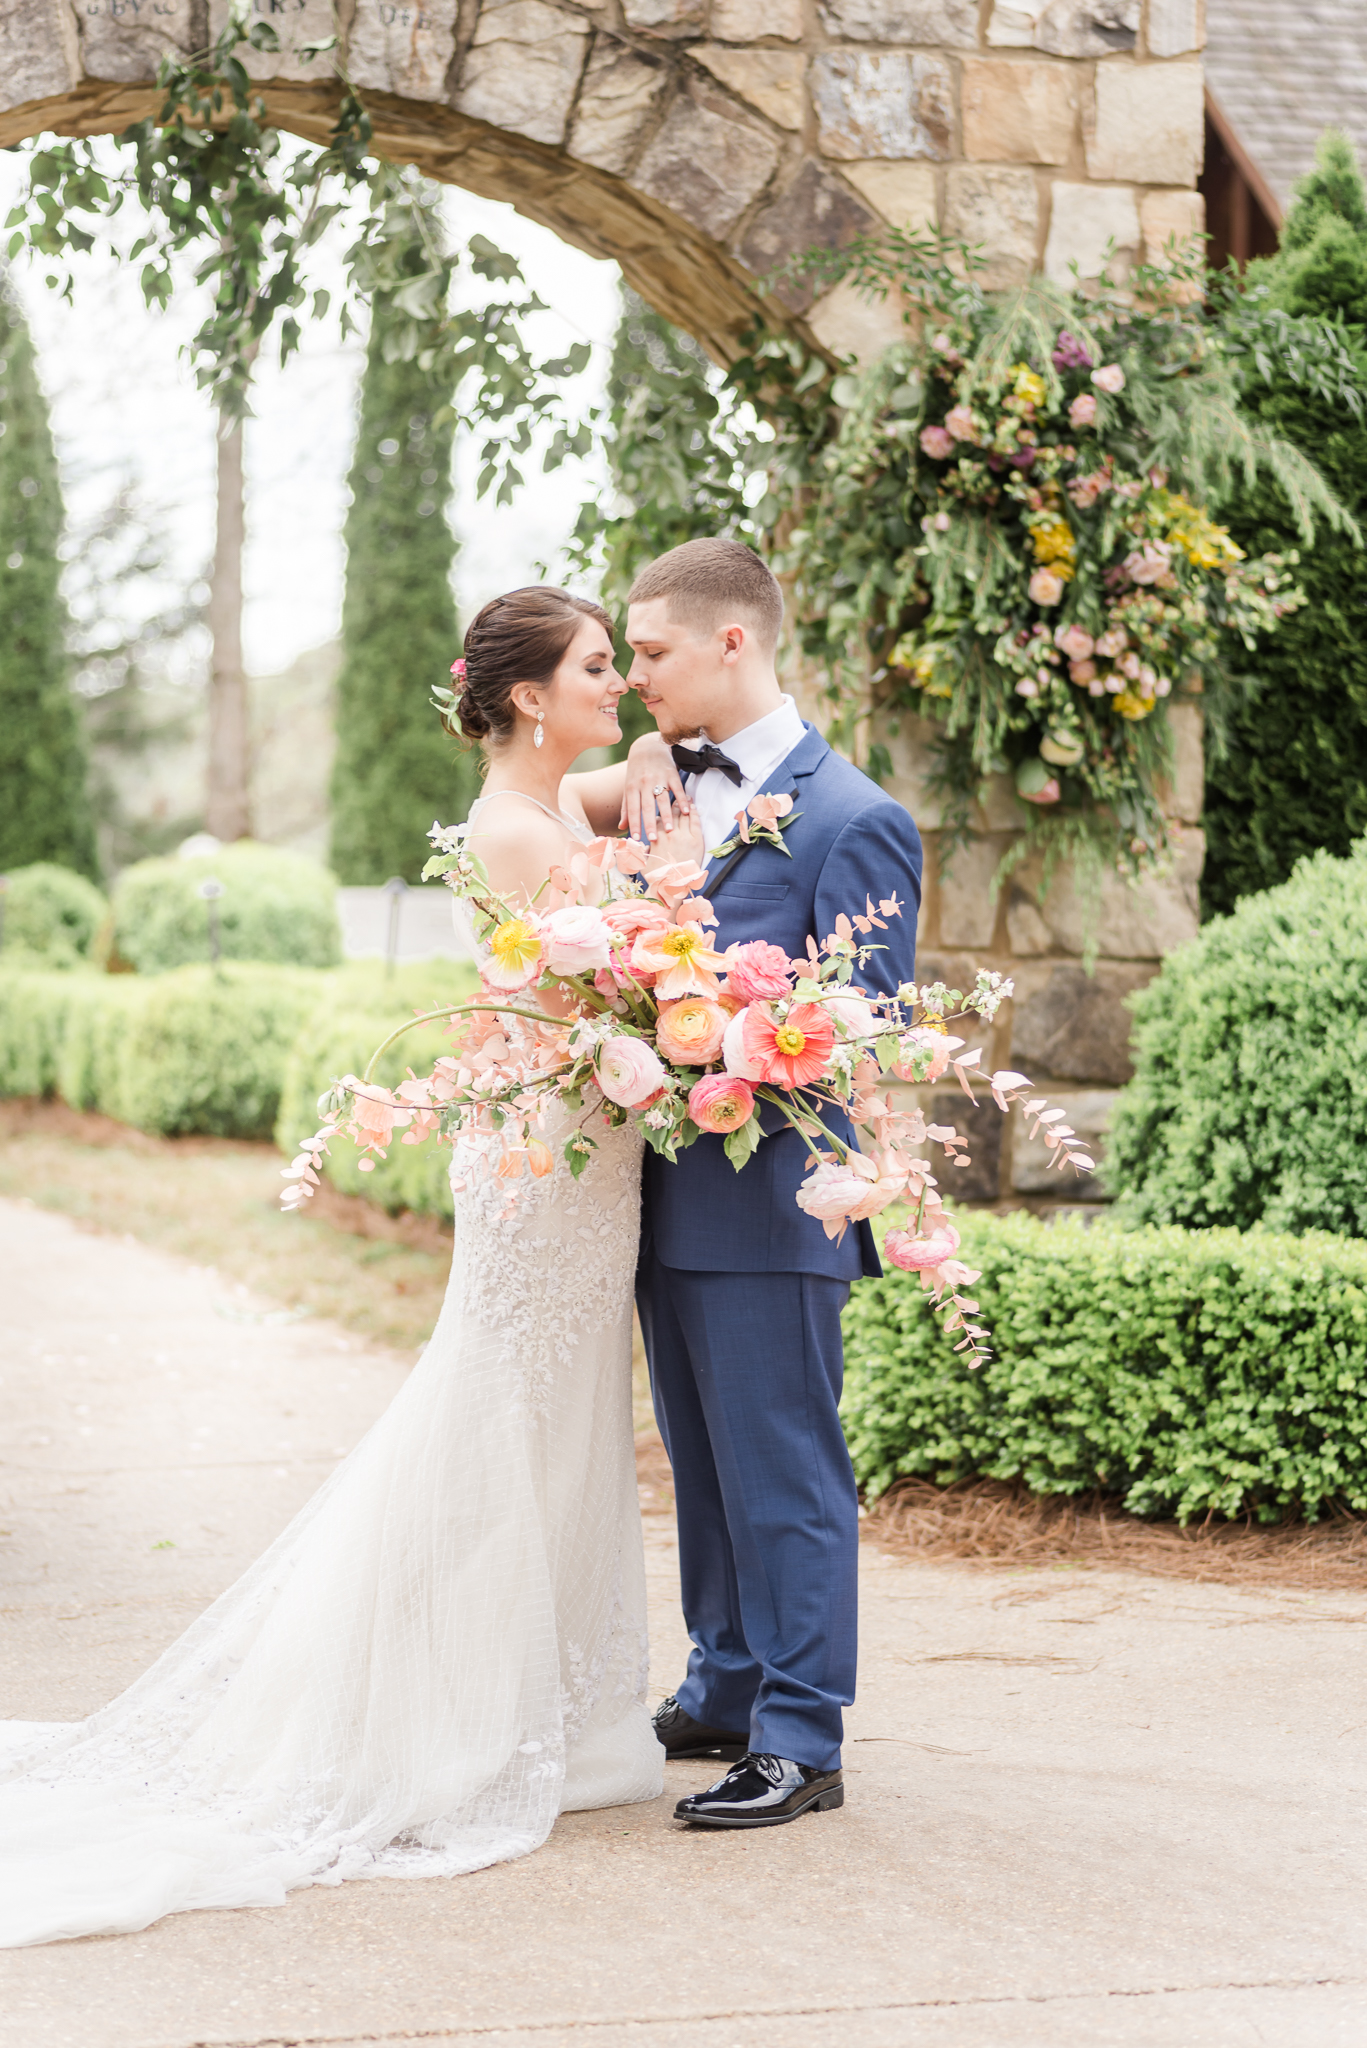 The Best Light and Airy Destination Wedding Photographers-3.jpg